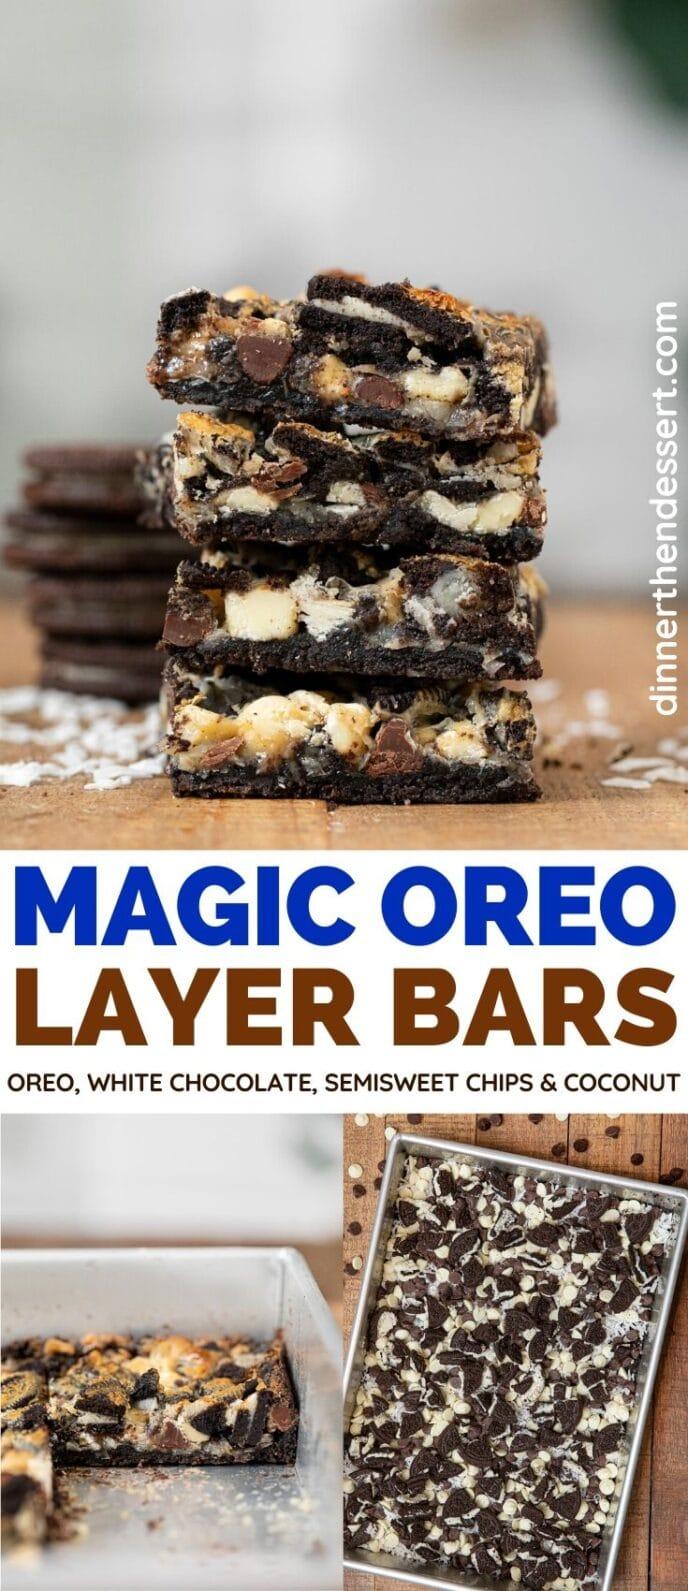 Magic Oreo Layer Bars collage